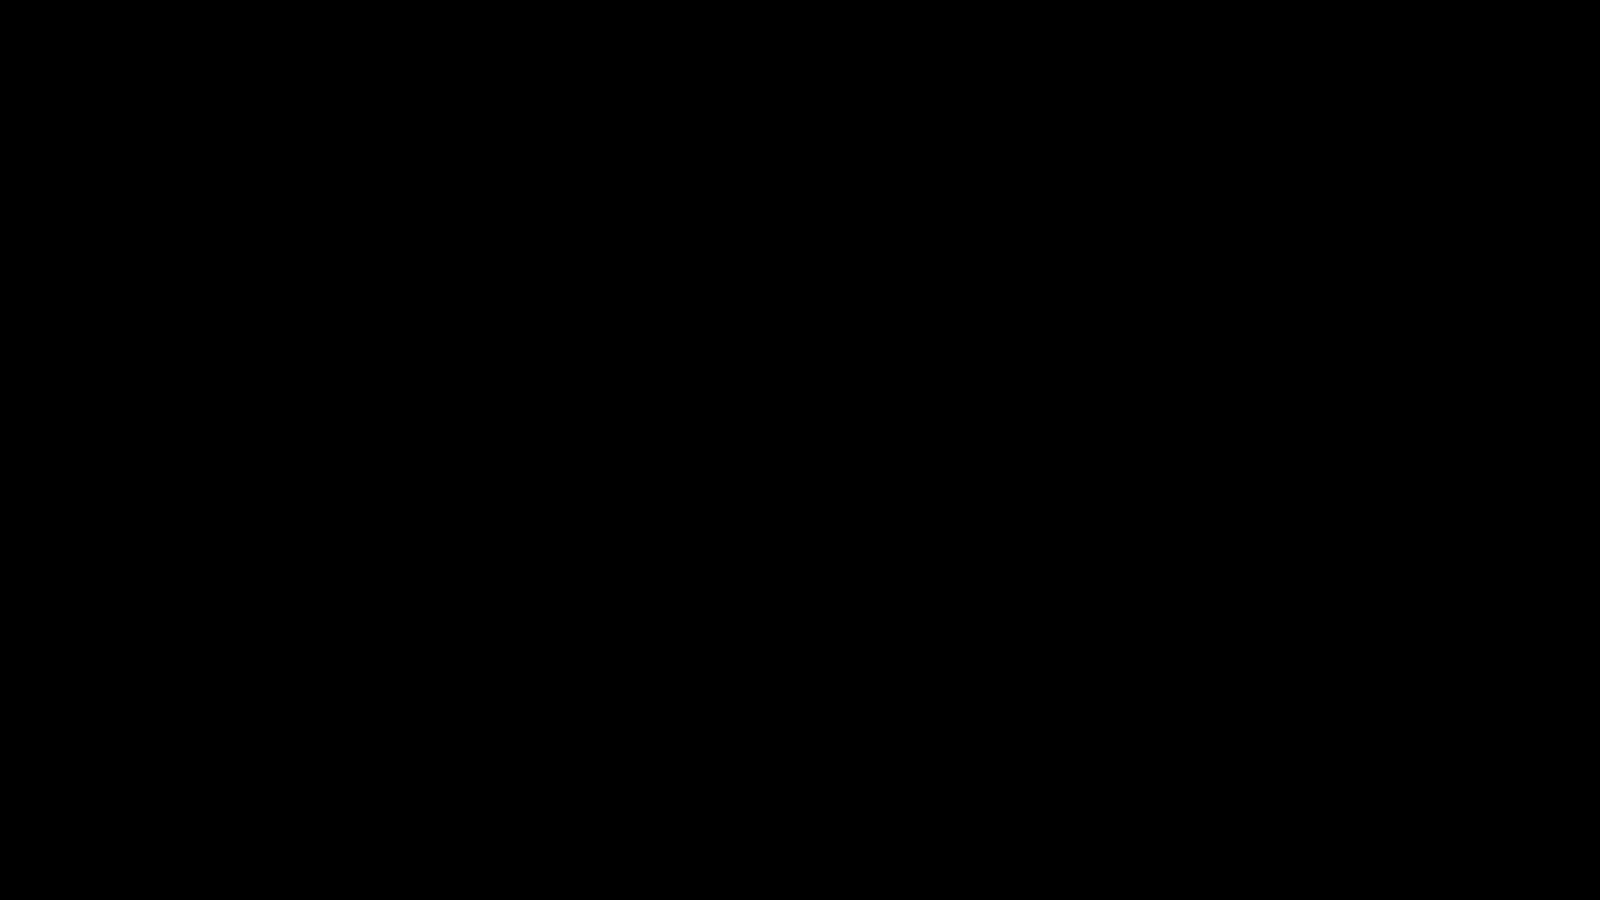 Silhueta invertida - Flor PNG